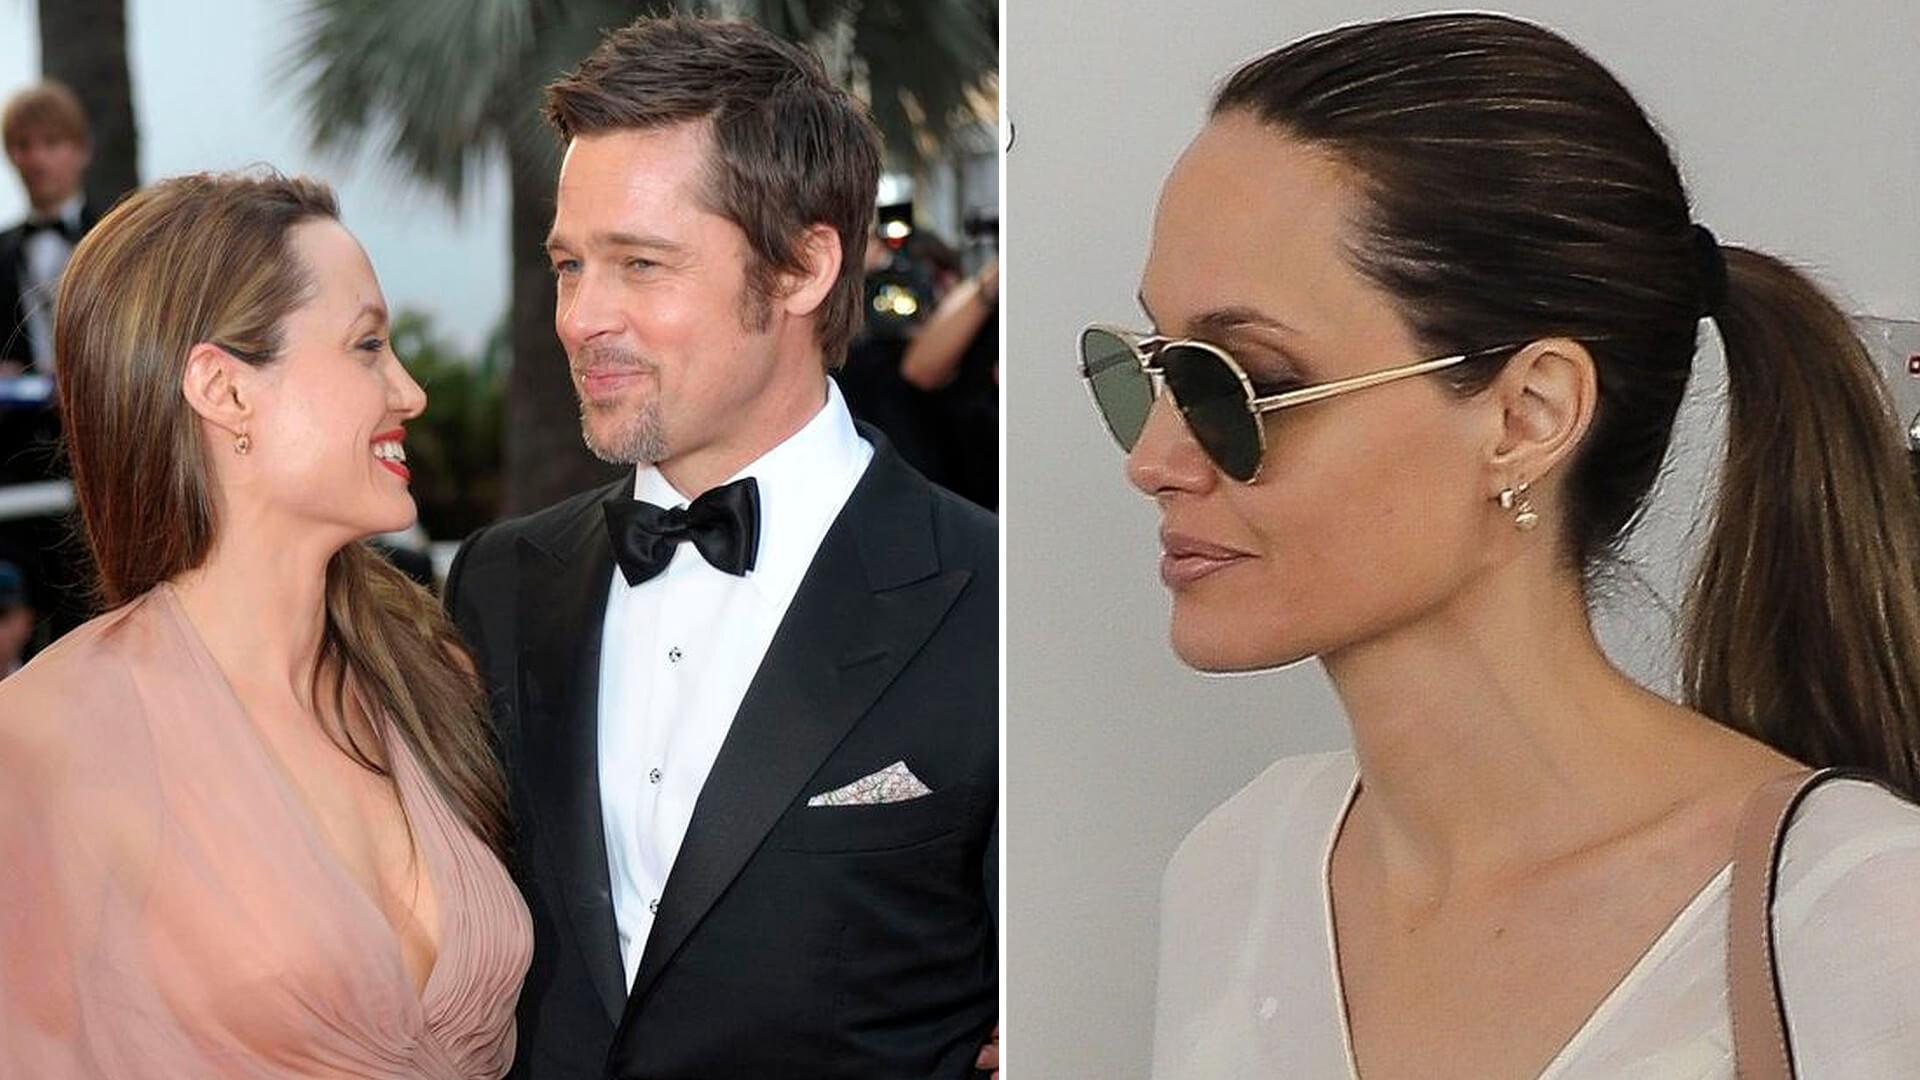 SZOK! Tak Angelina Jolie odbiła Brada Pita Jennifer Aniston